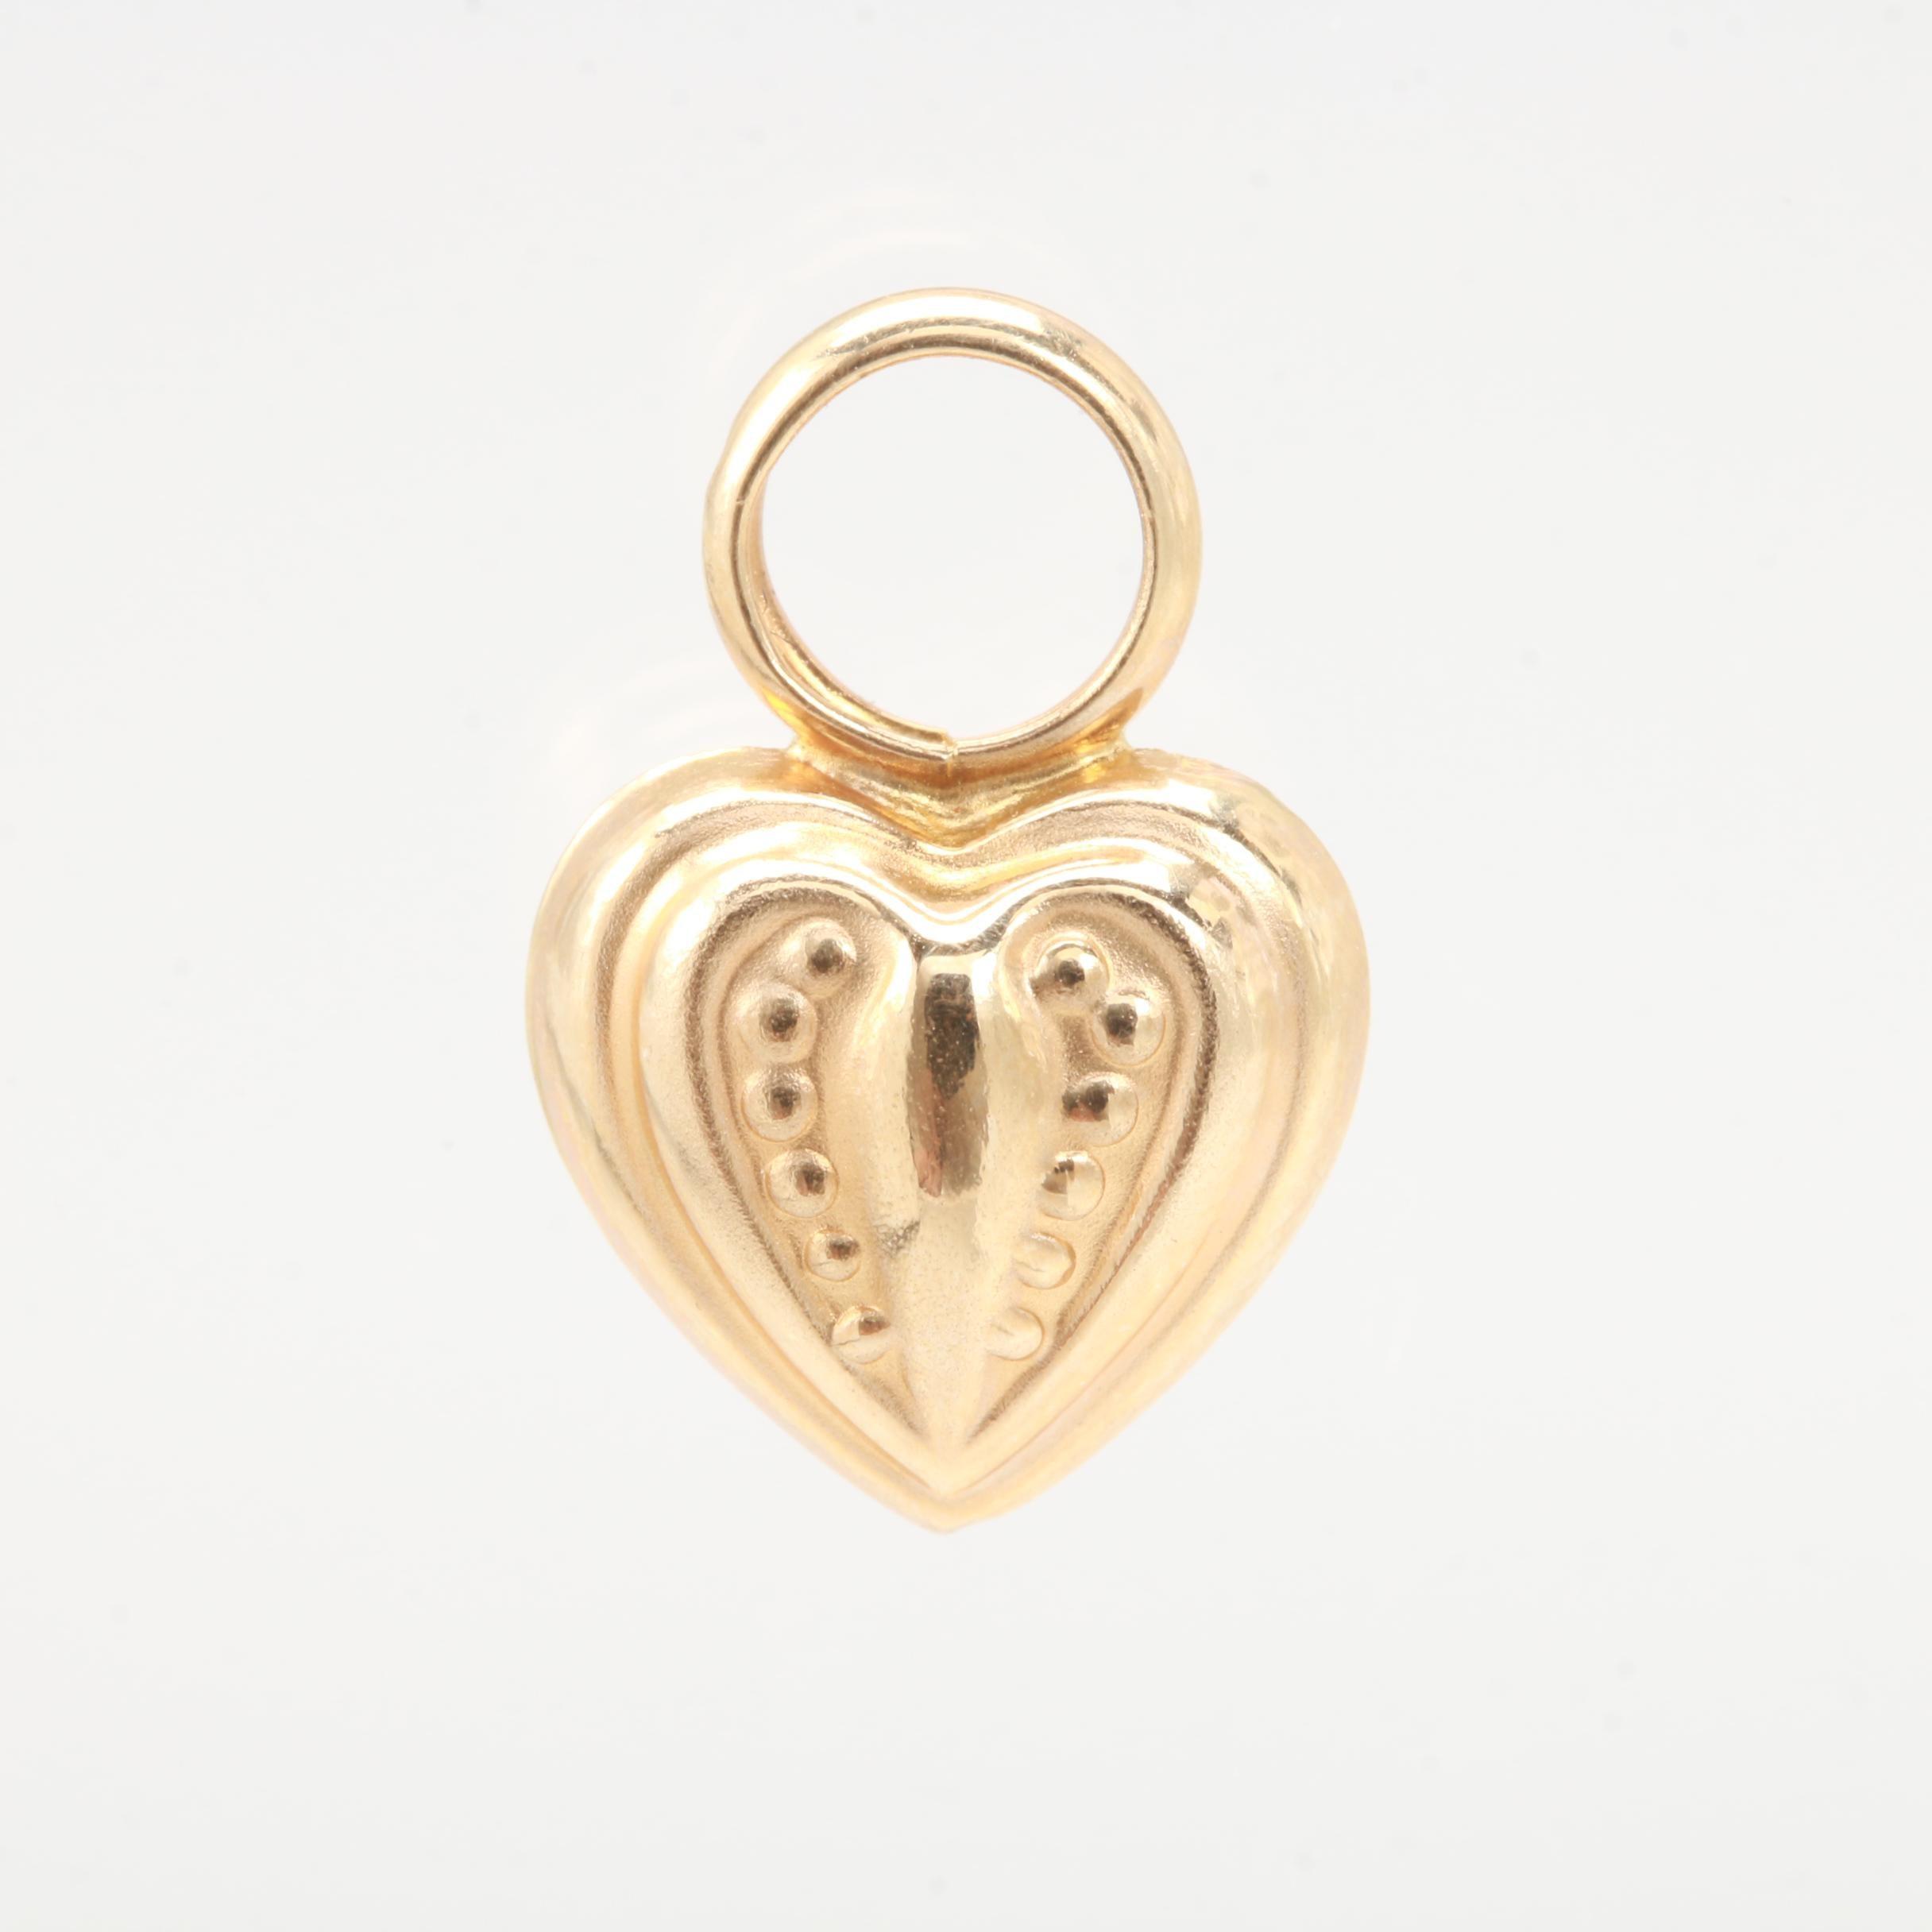 Peter Brams Designs 14K Yellow Gold Heart Pendant